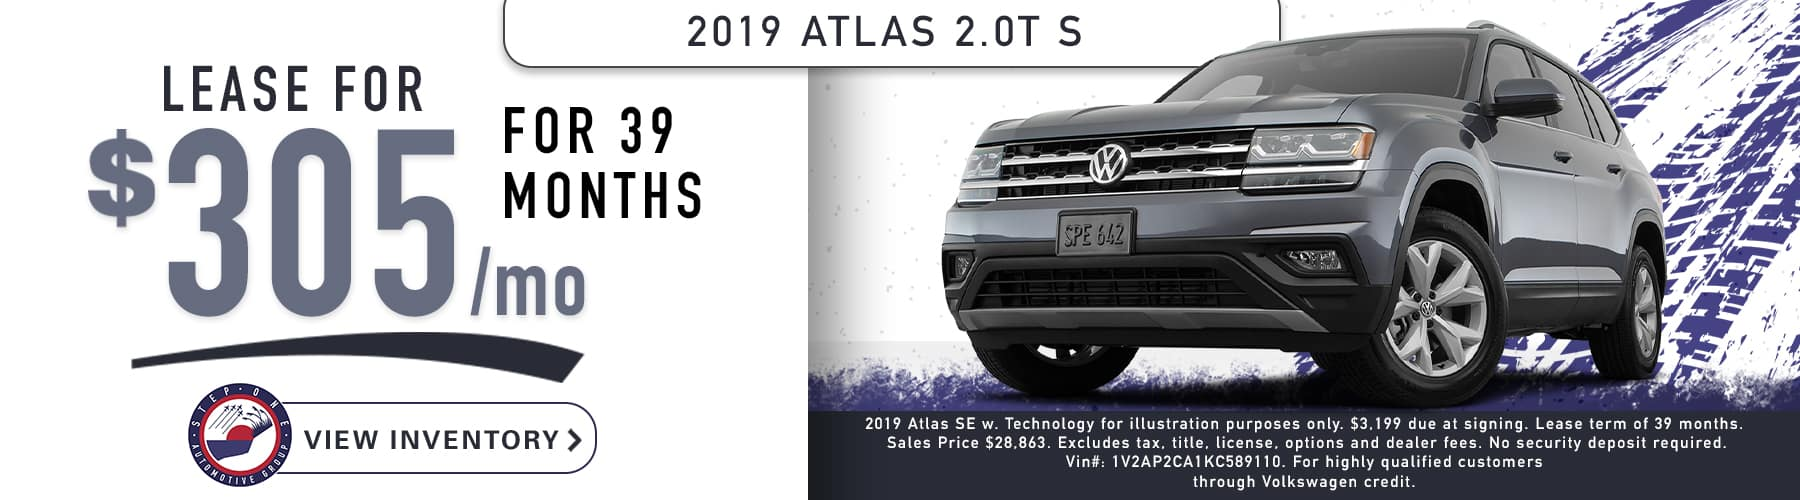 VW Fort Walton Beach February 2020 2019 Atlas 1800x500